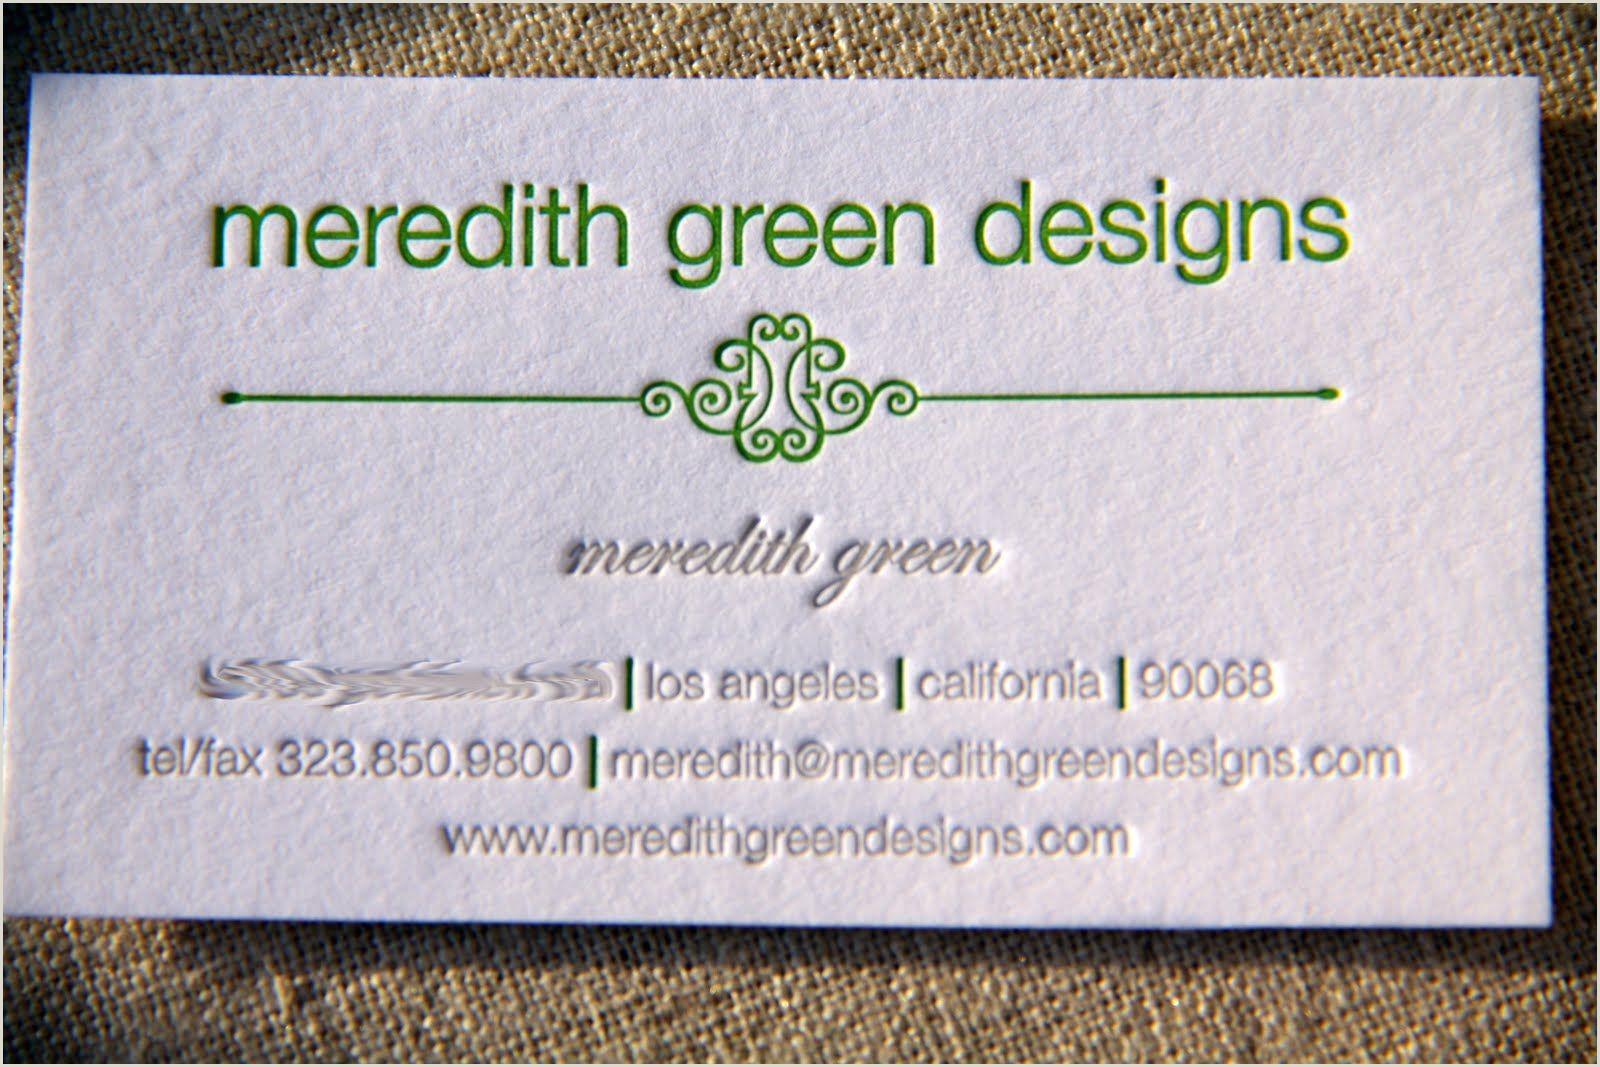 Interior Design Business Cards Ideas Interior Design Business Card Designs Business Card For